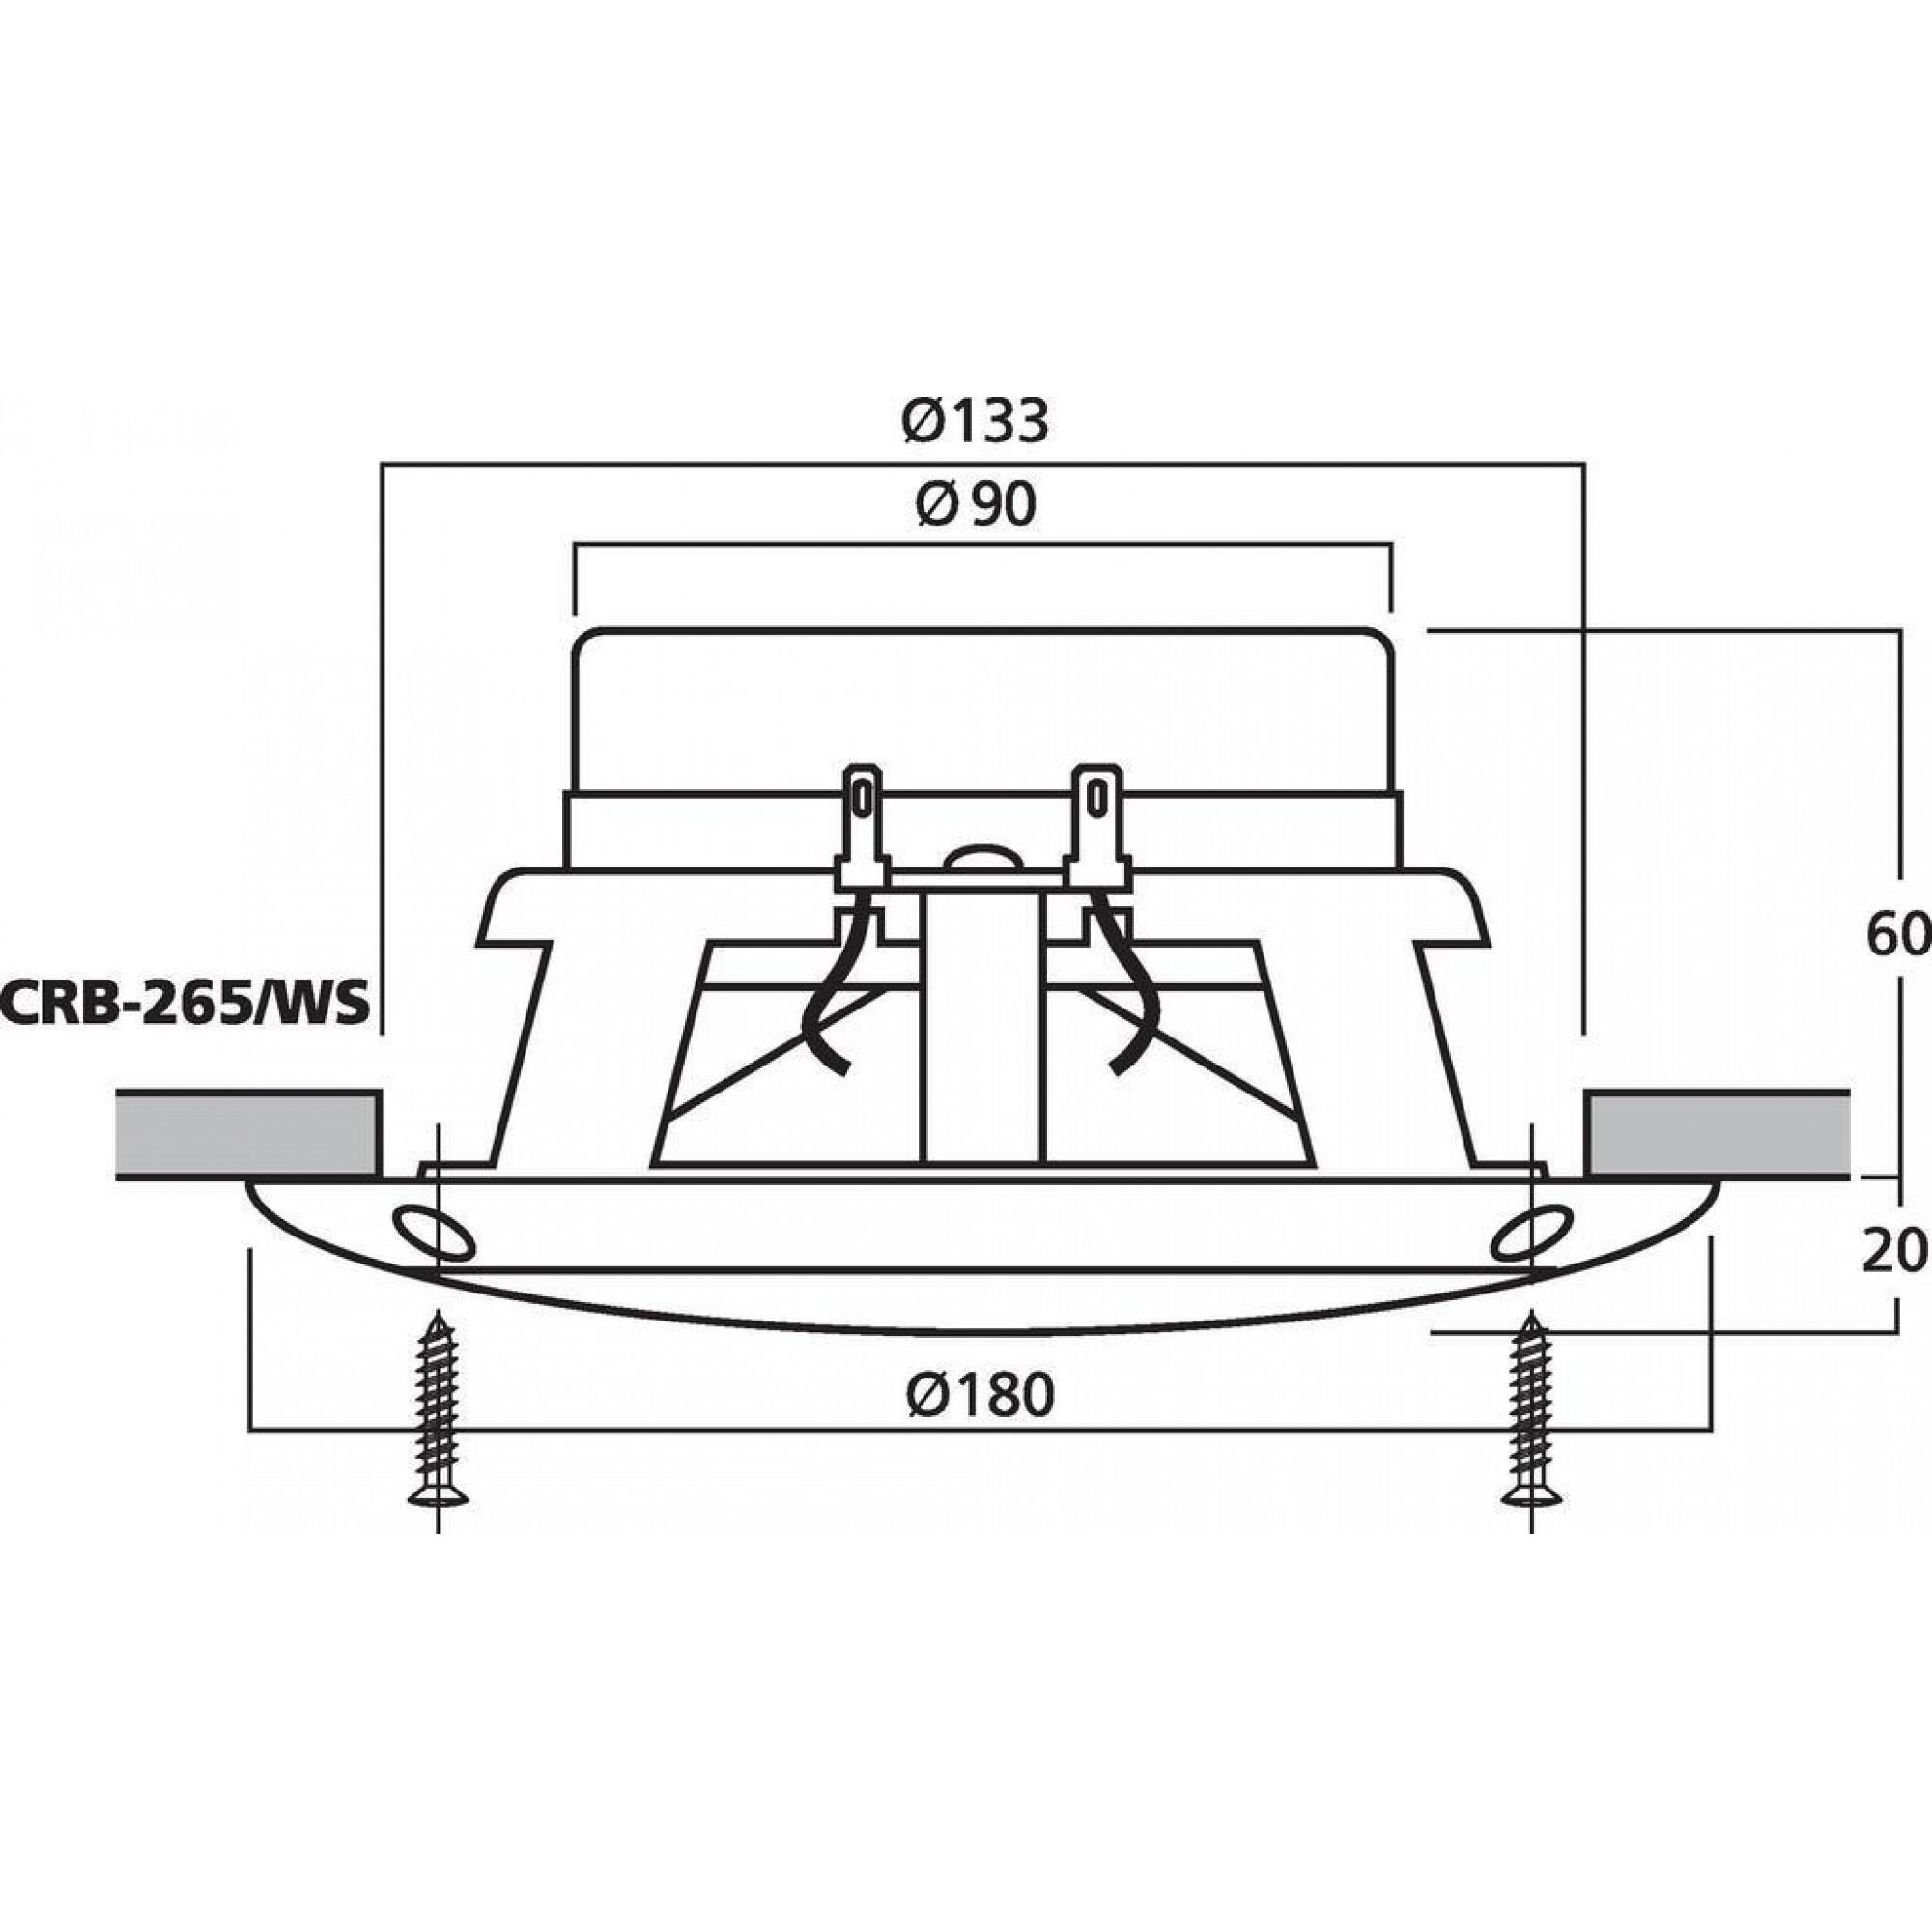 CARPOWER CRB-265/WS